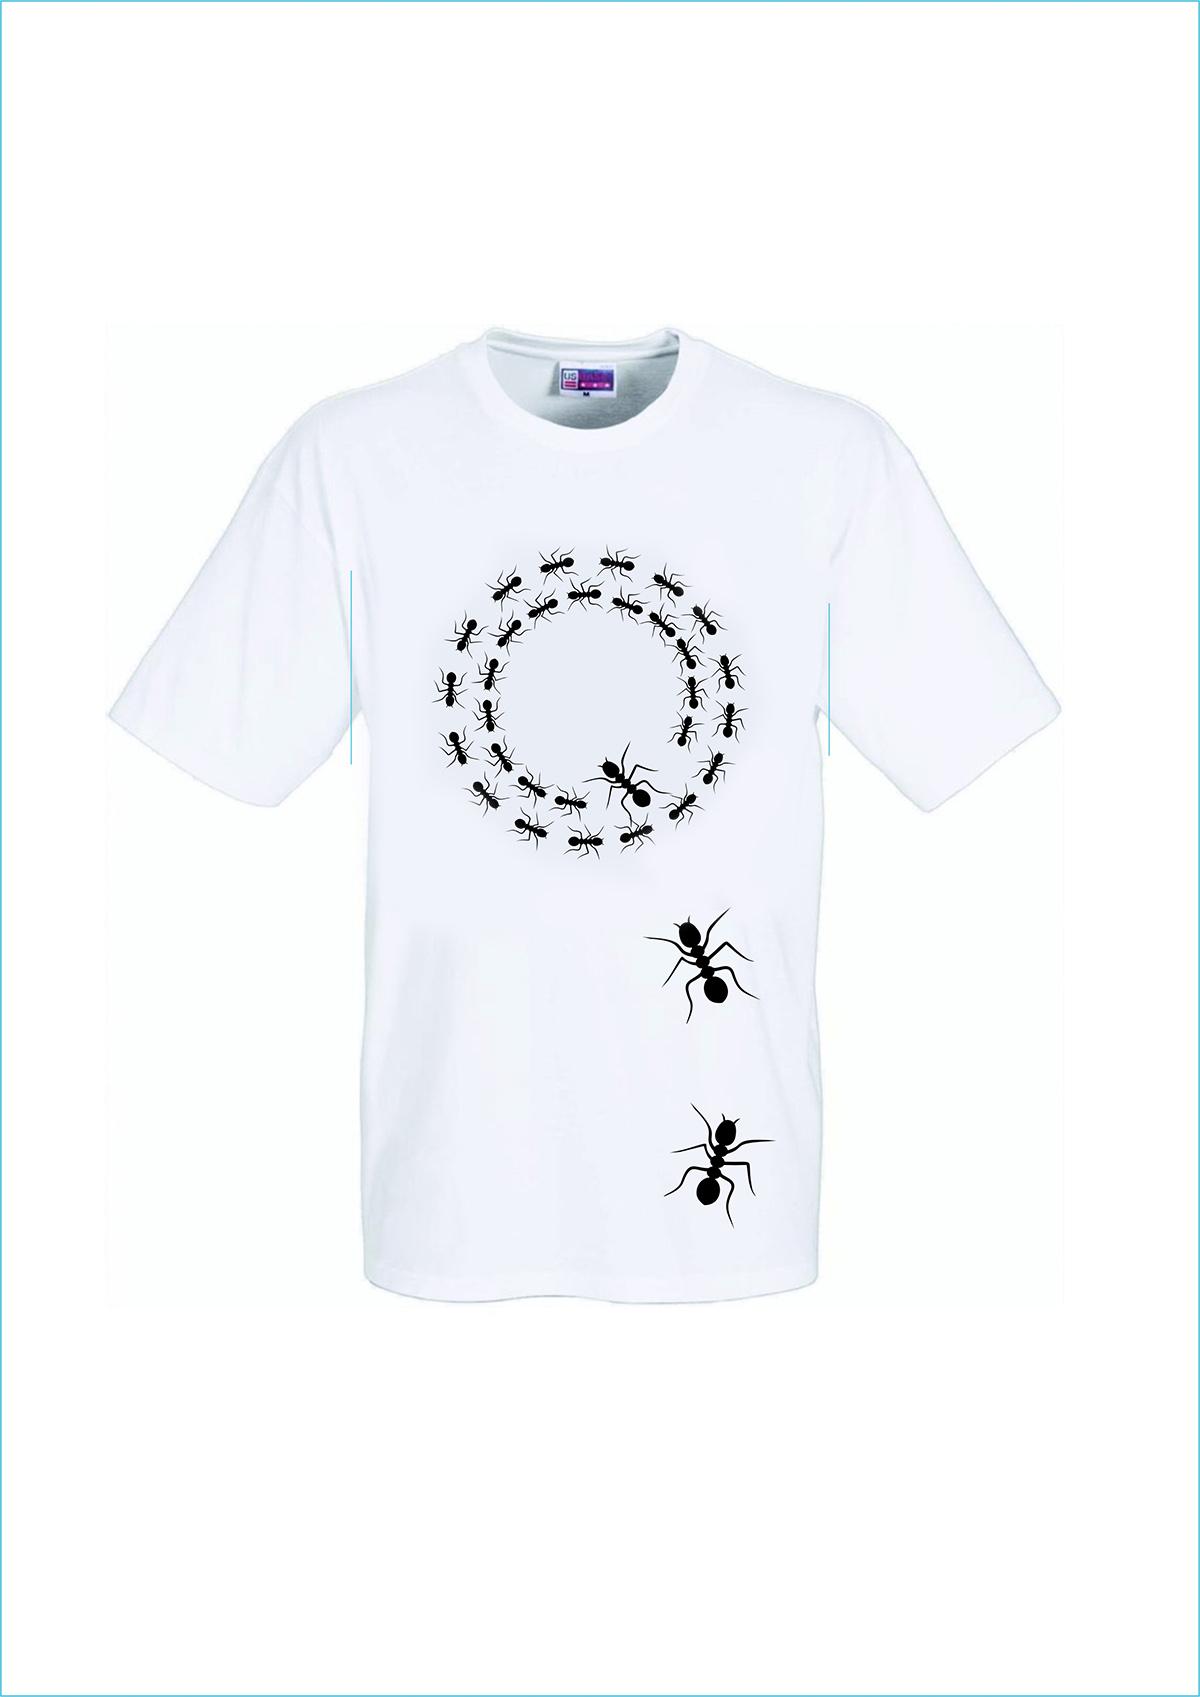 дизайн футболок для печати